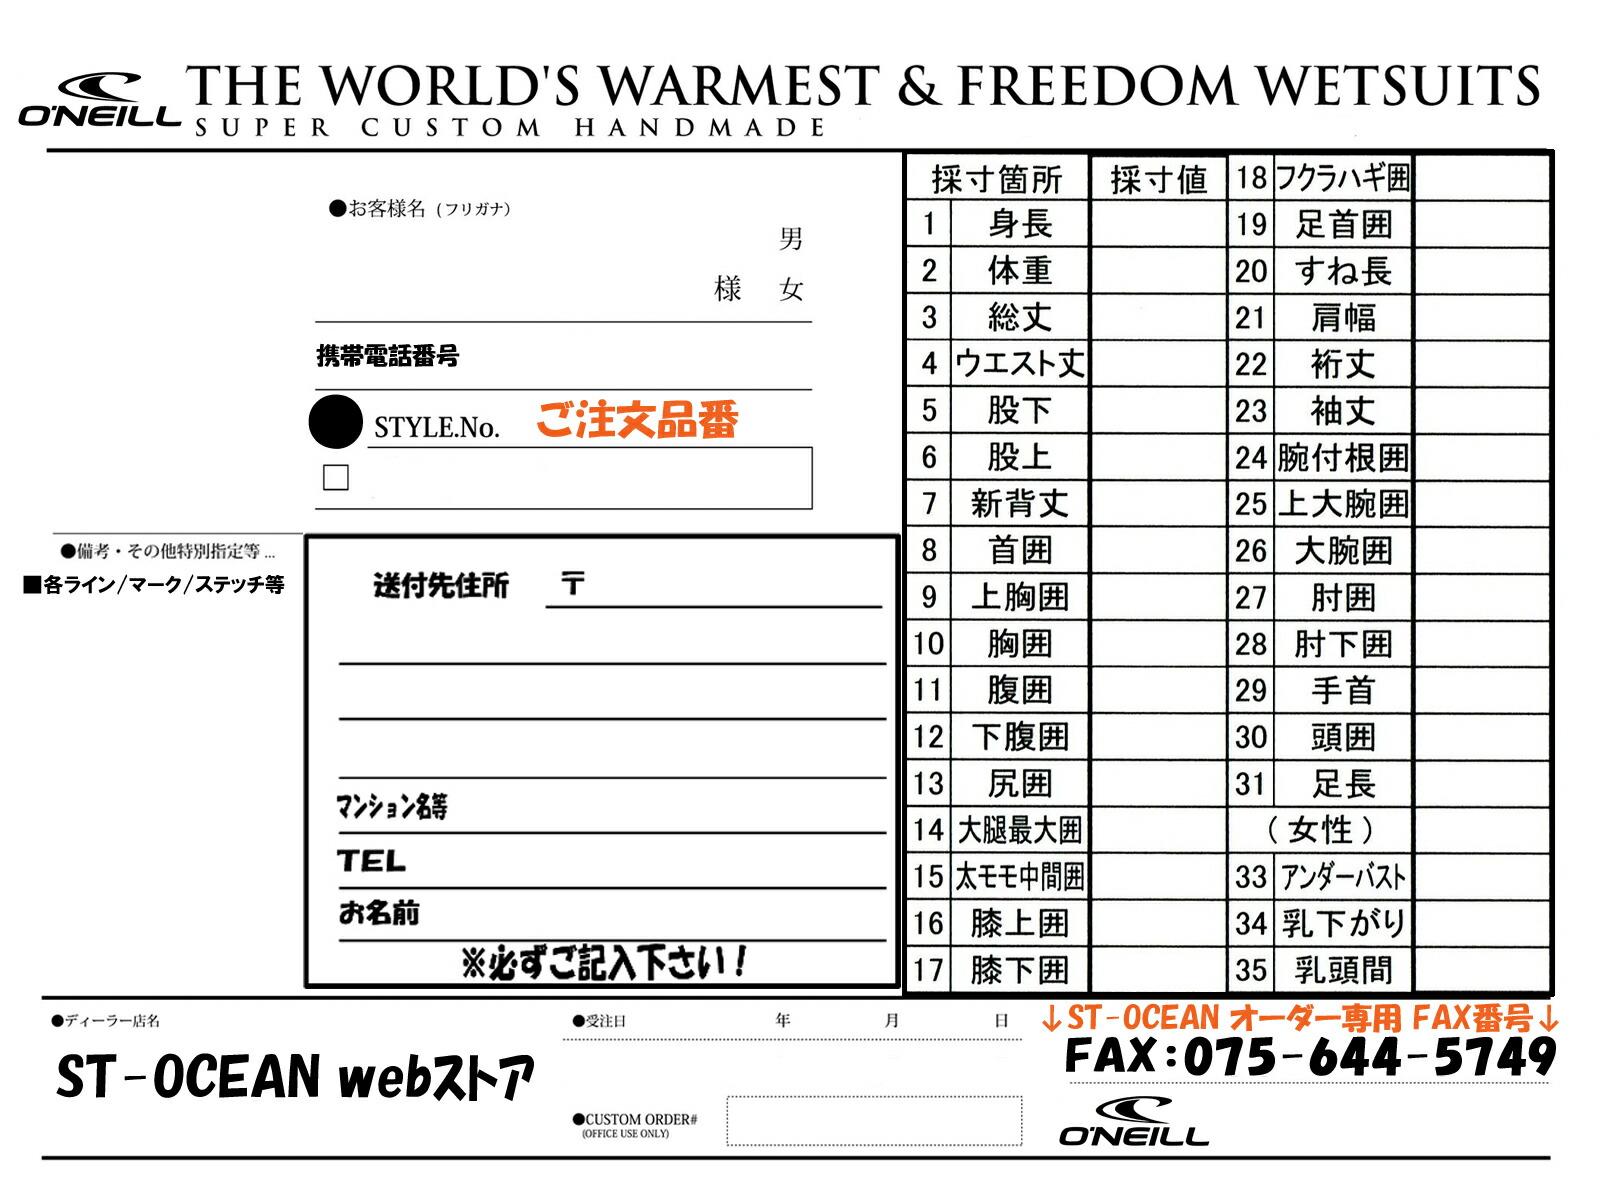 【O'NEILL(オニール)日本正規品】セミドライカスタムオーダー2014~2015年冬用BACKZIPPER(バックジッパー)HEATSERIESBLACKOUTZIP(ヒートシリーズブラックアウトジップ)FIREWALL6仕様オニールウエット【メンズモデル】品番XSF-6270ウェットスーツ